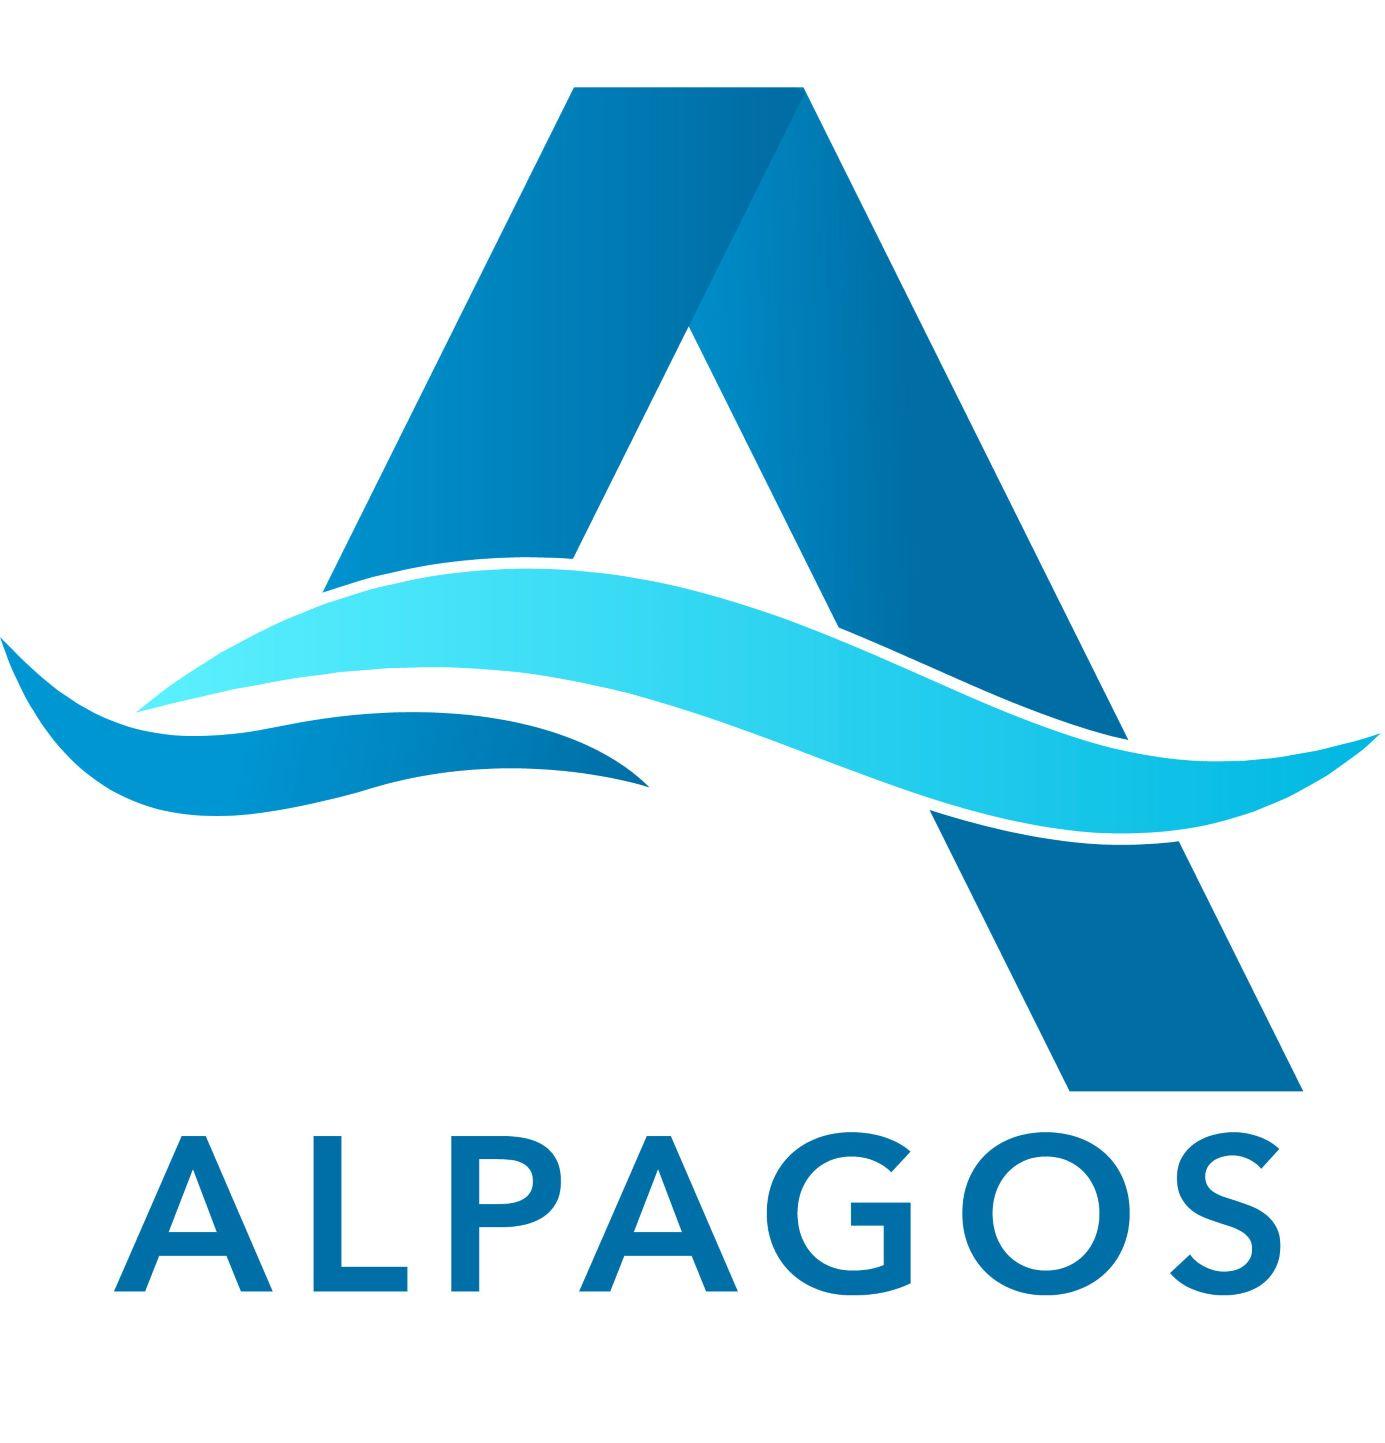 Alpagos